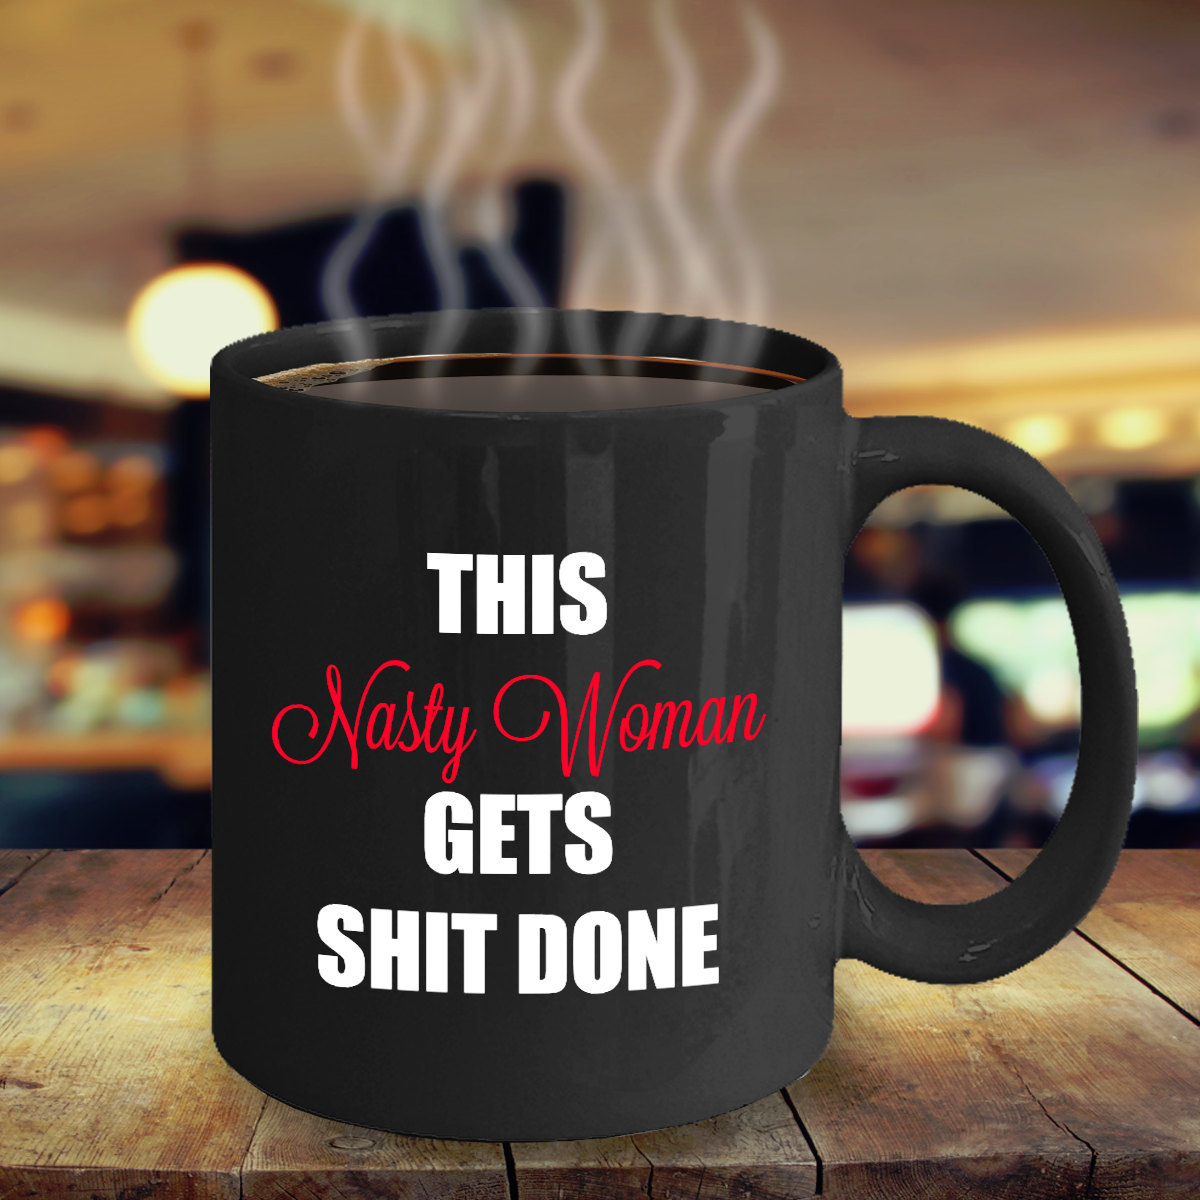 Nasty Woman Funny Coffee Mug Gift Mugs with Saying For Him Her Men Women Dad Mom